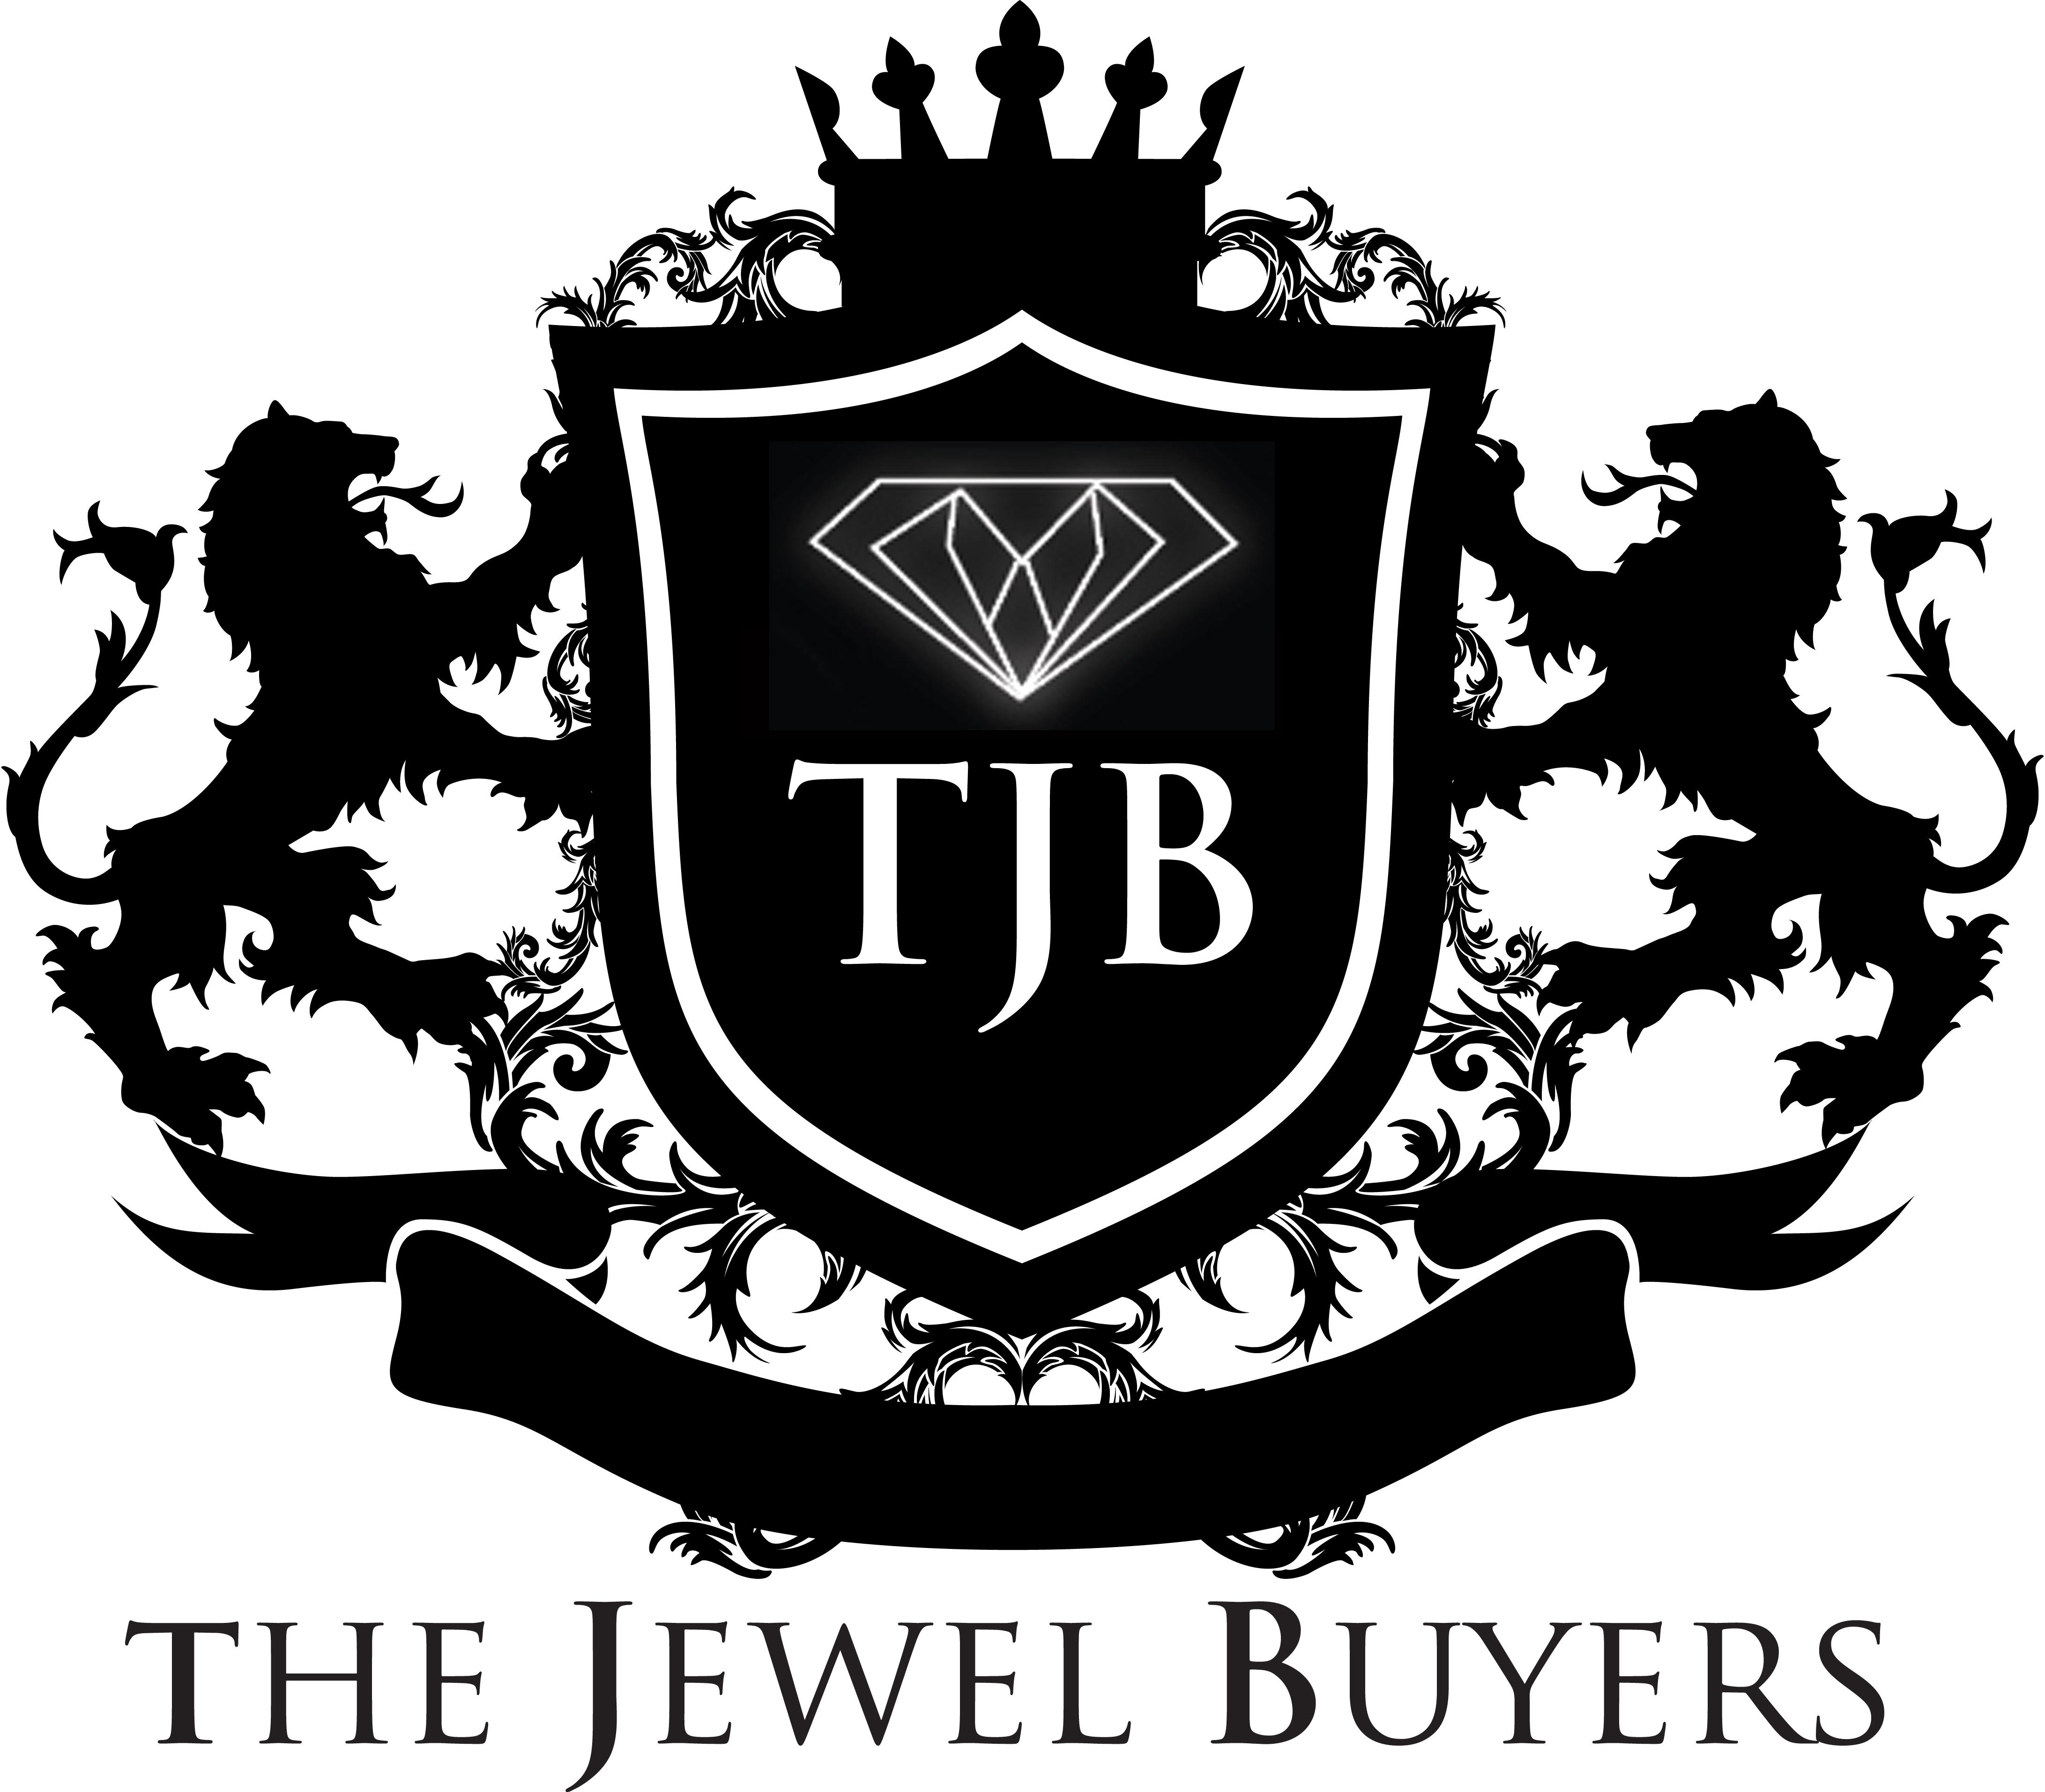 The Jewel Buyers